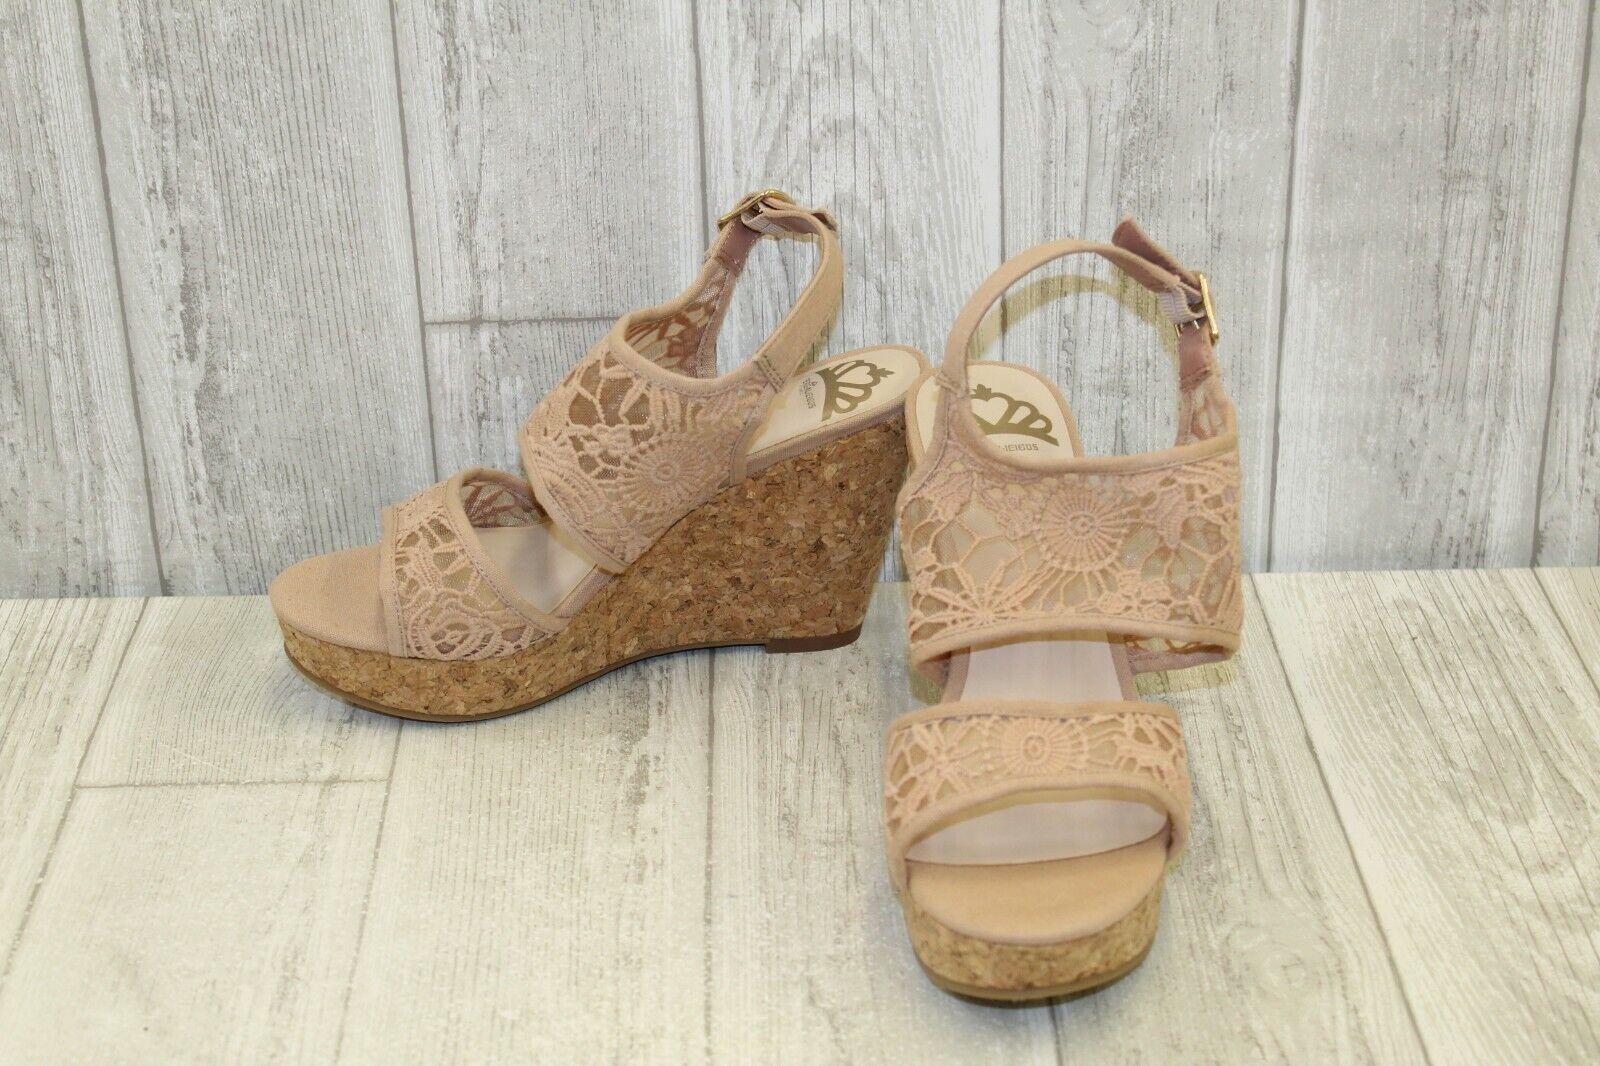 Fergalicious Krazy Wedge Sandal - Women's Size 9M - bluesh